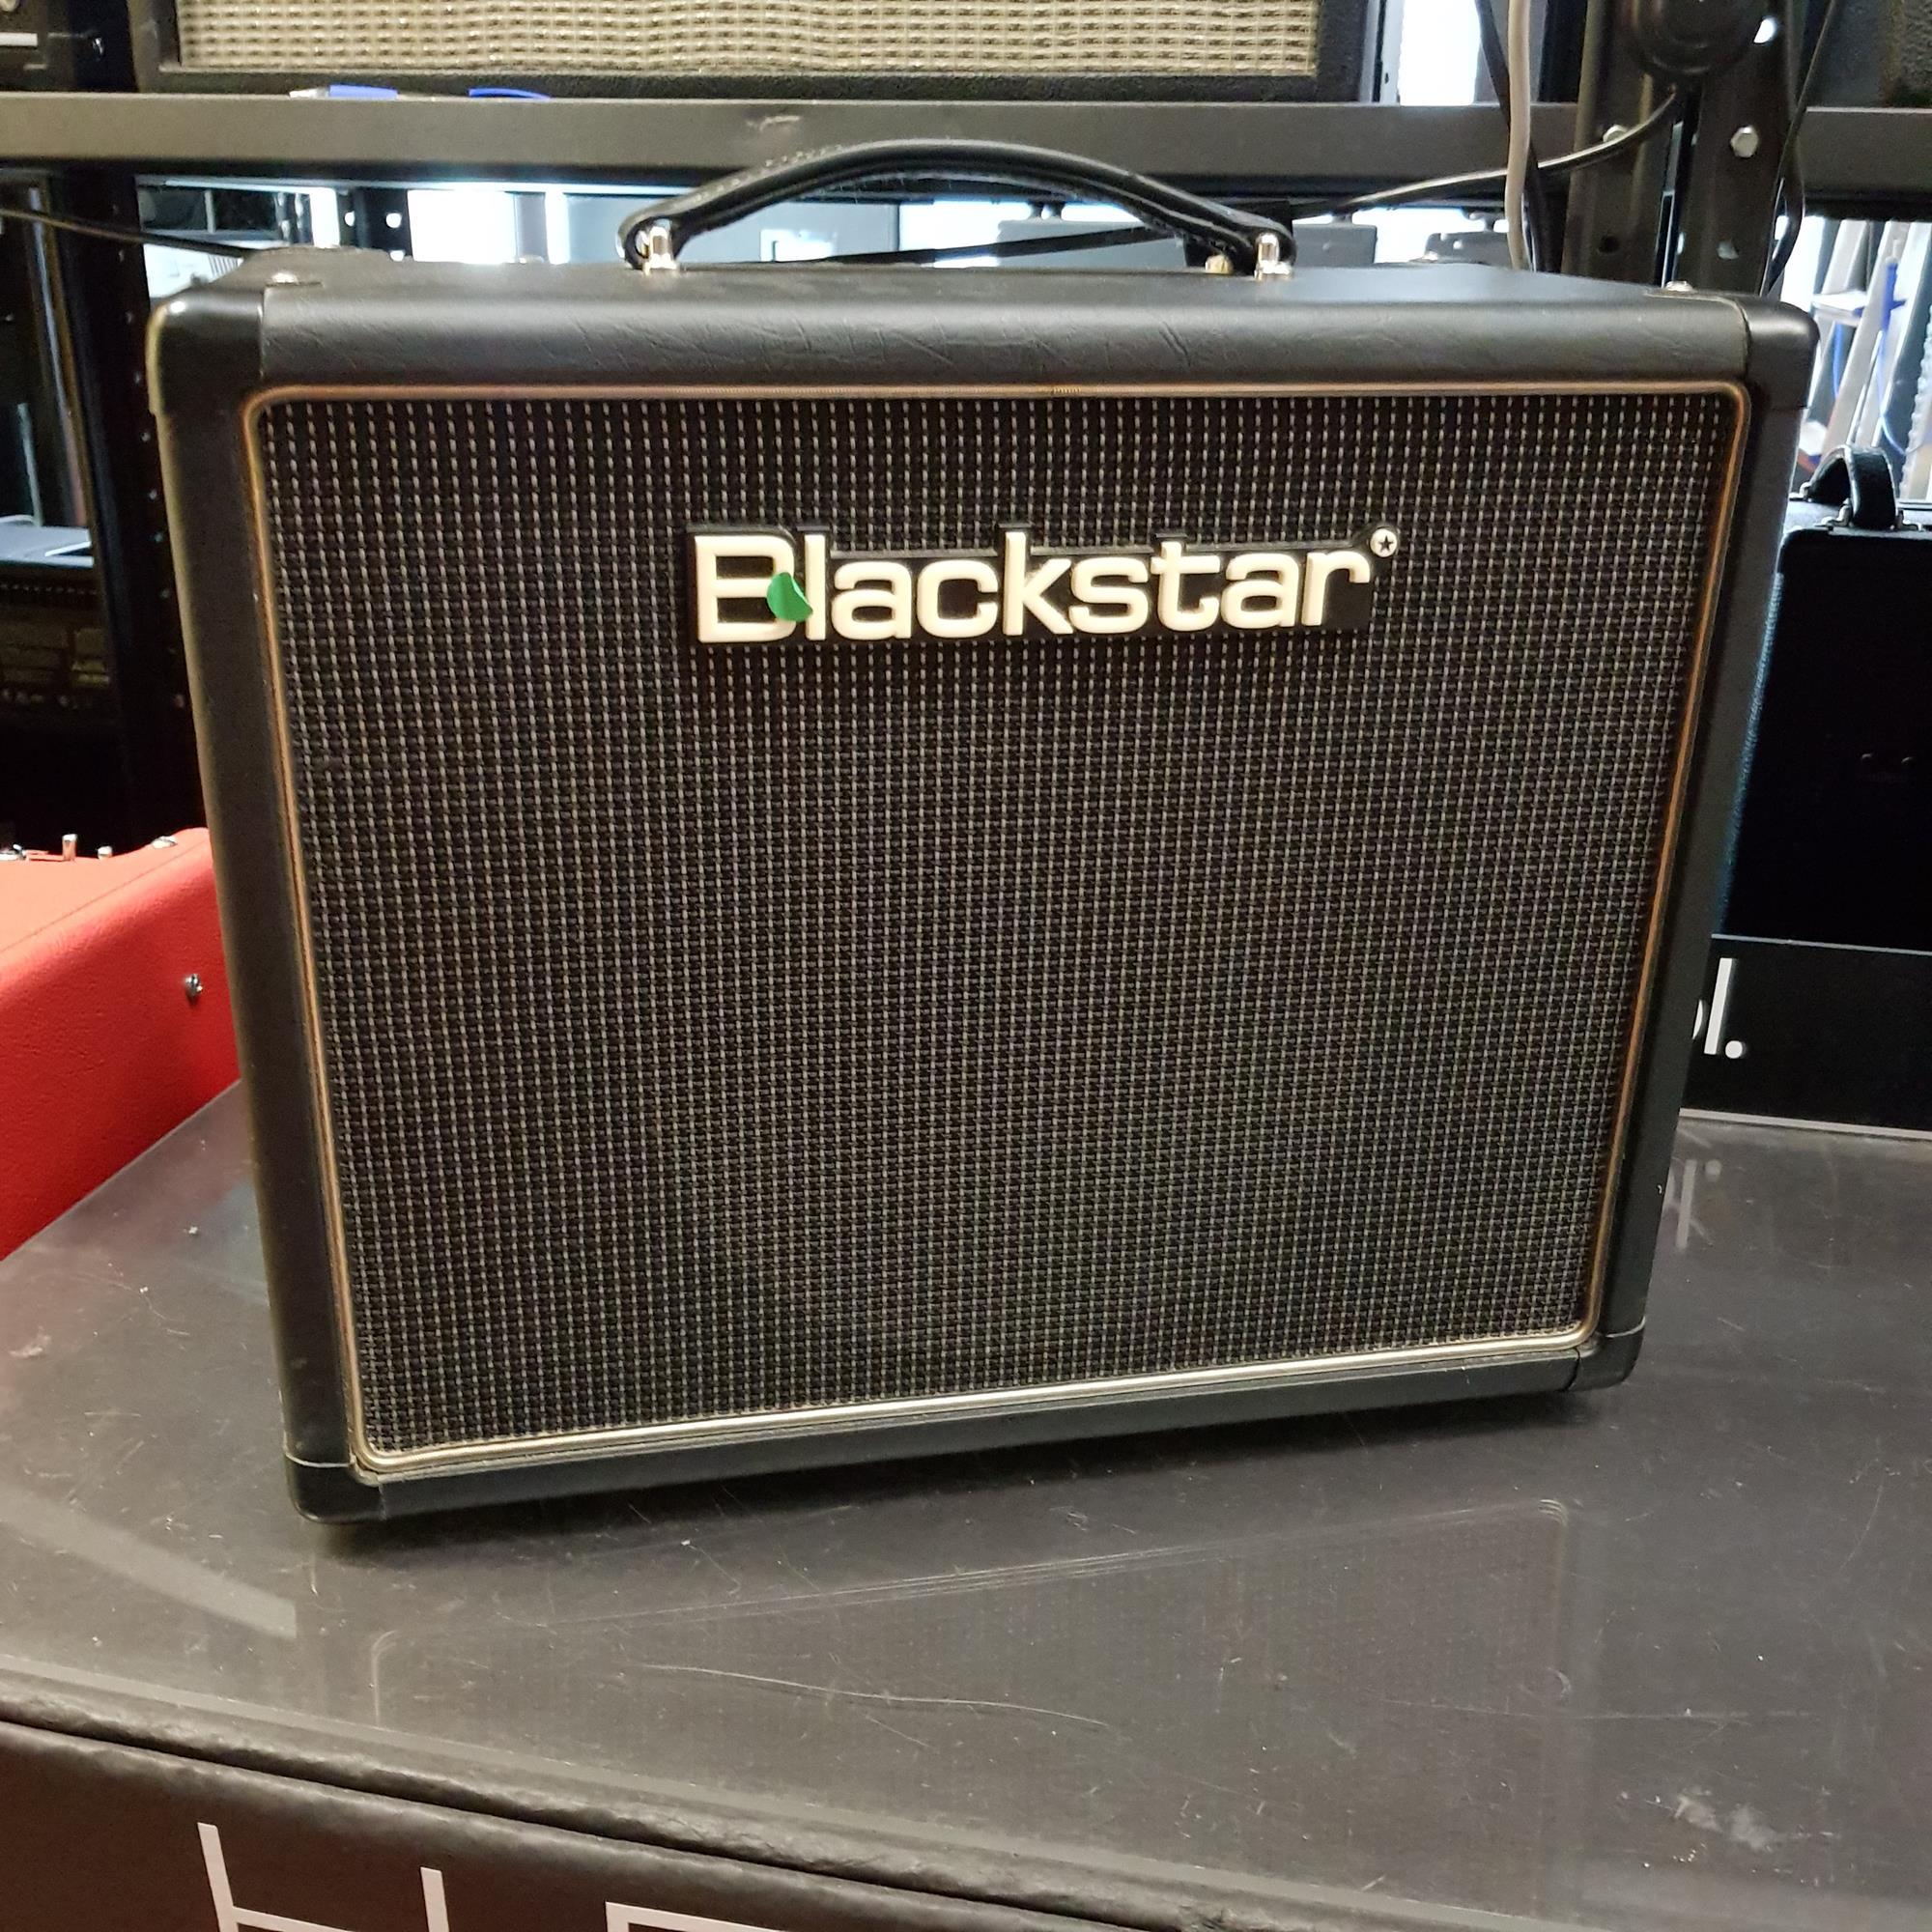 BLACKSTAR-HT-5-COMBO-MK-1-sku-1624117118099